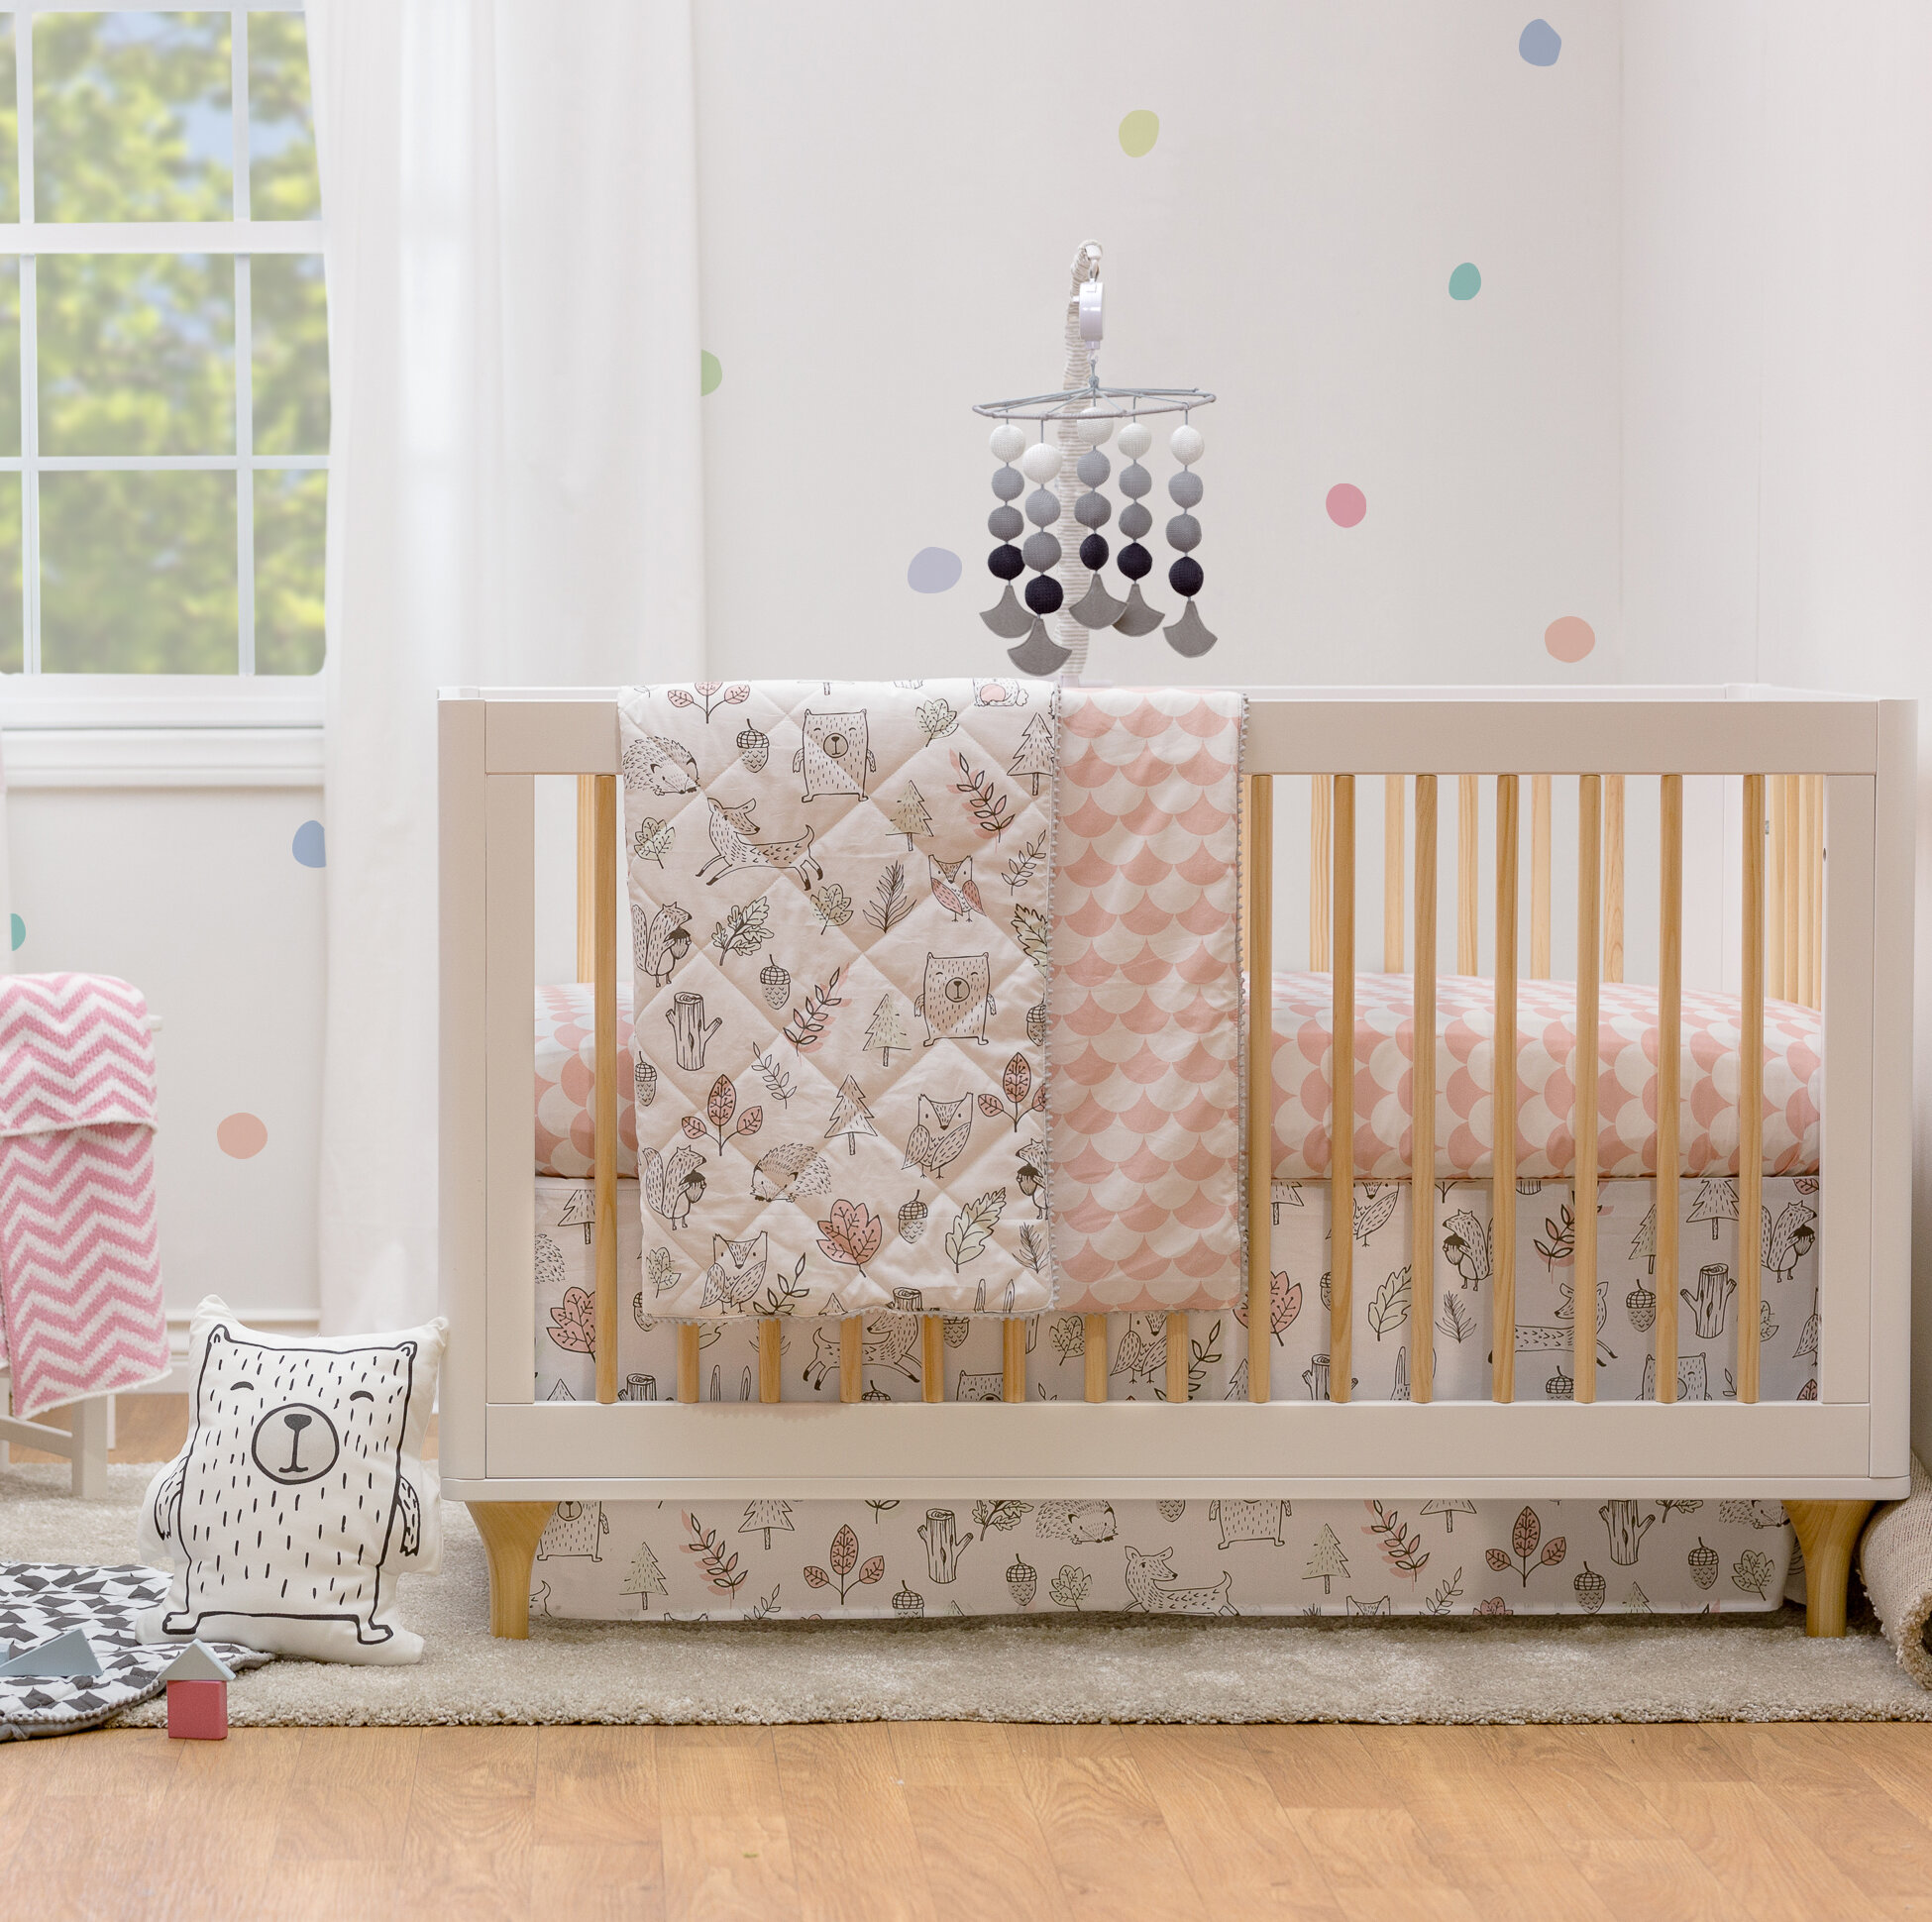 New 7 Pcs Baby Bedding Set Baby Cot Crib Bedding Set Cartoon Animal Baby Crib Set Quilt Bumper Sheet Skirt Harmonious Colors Mother & Kids